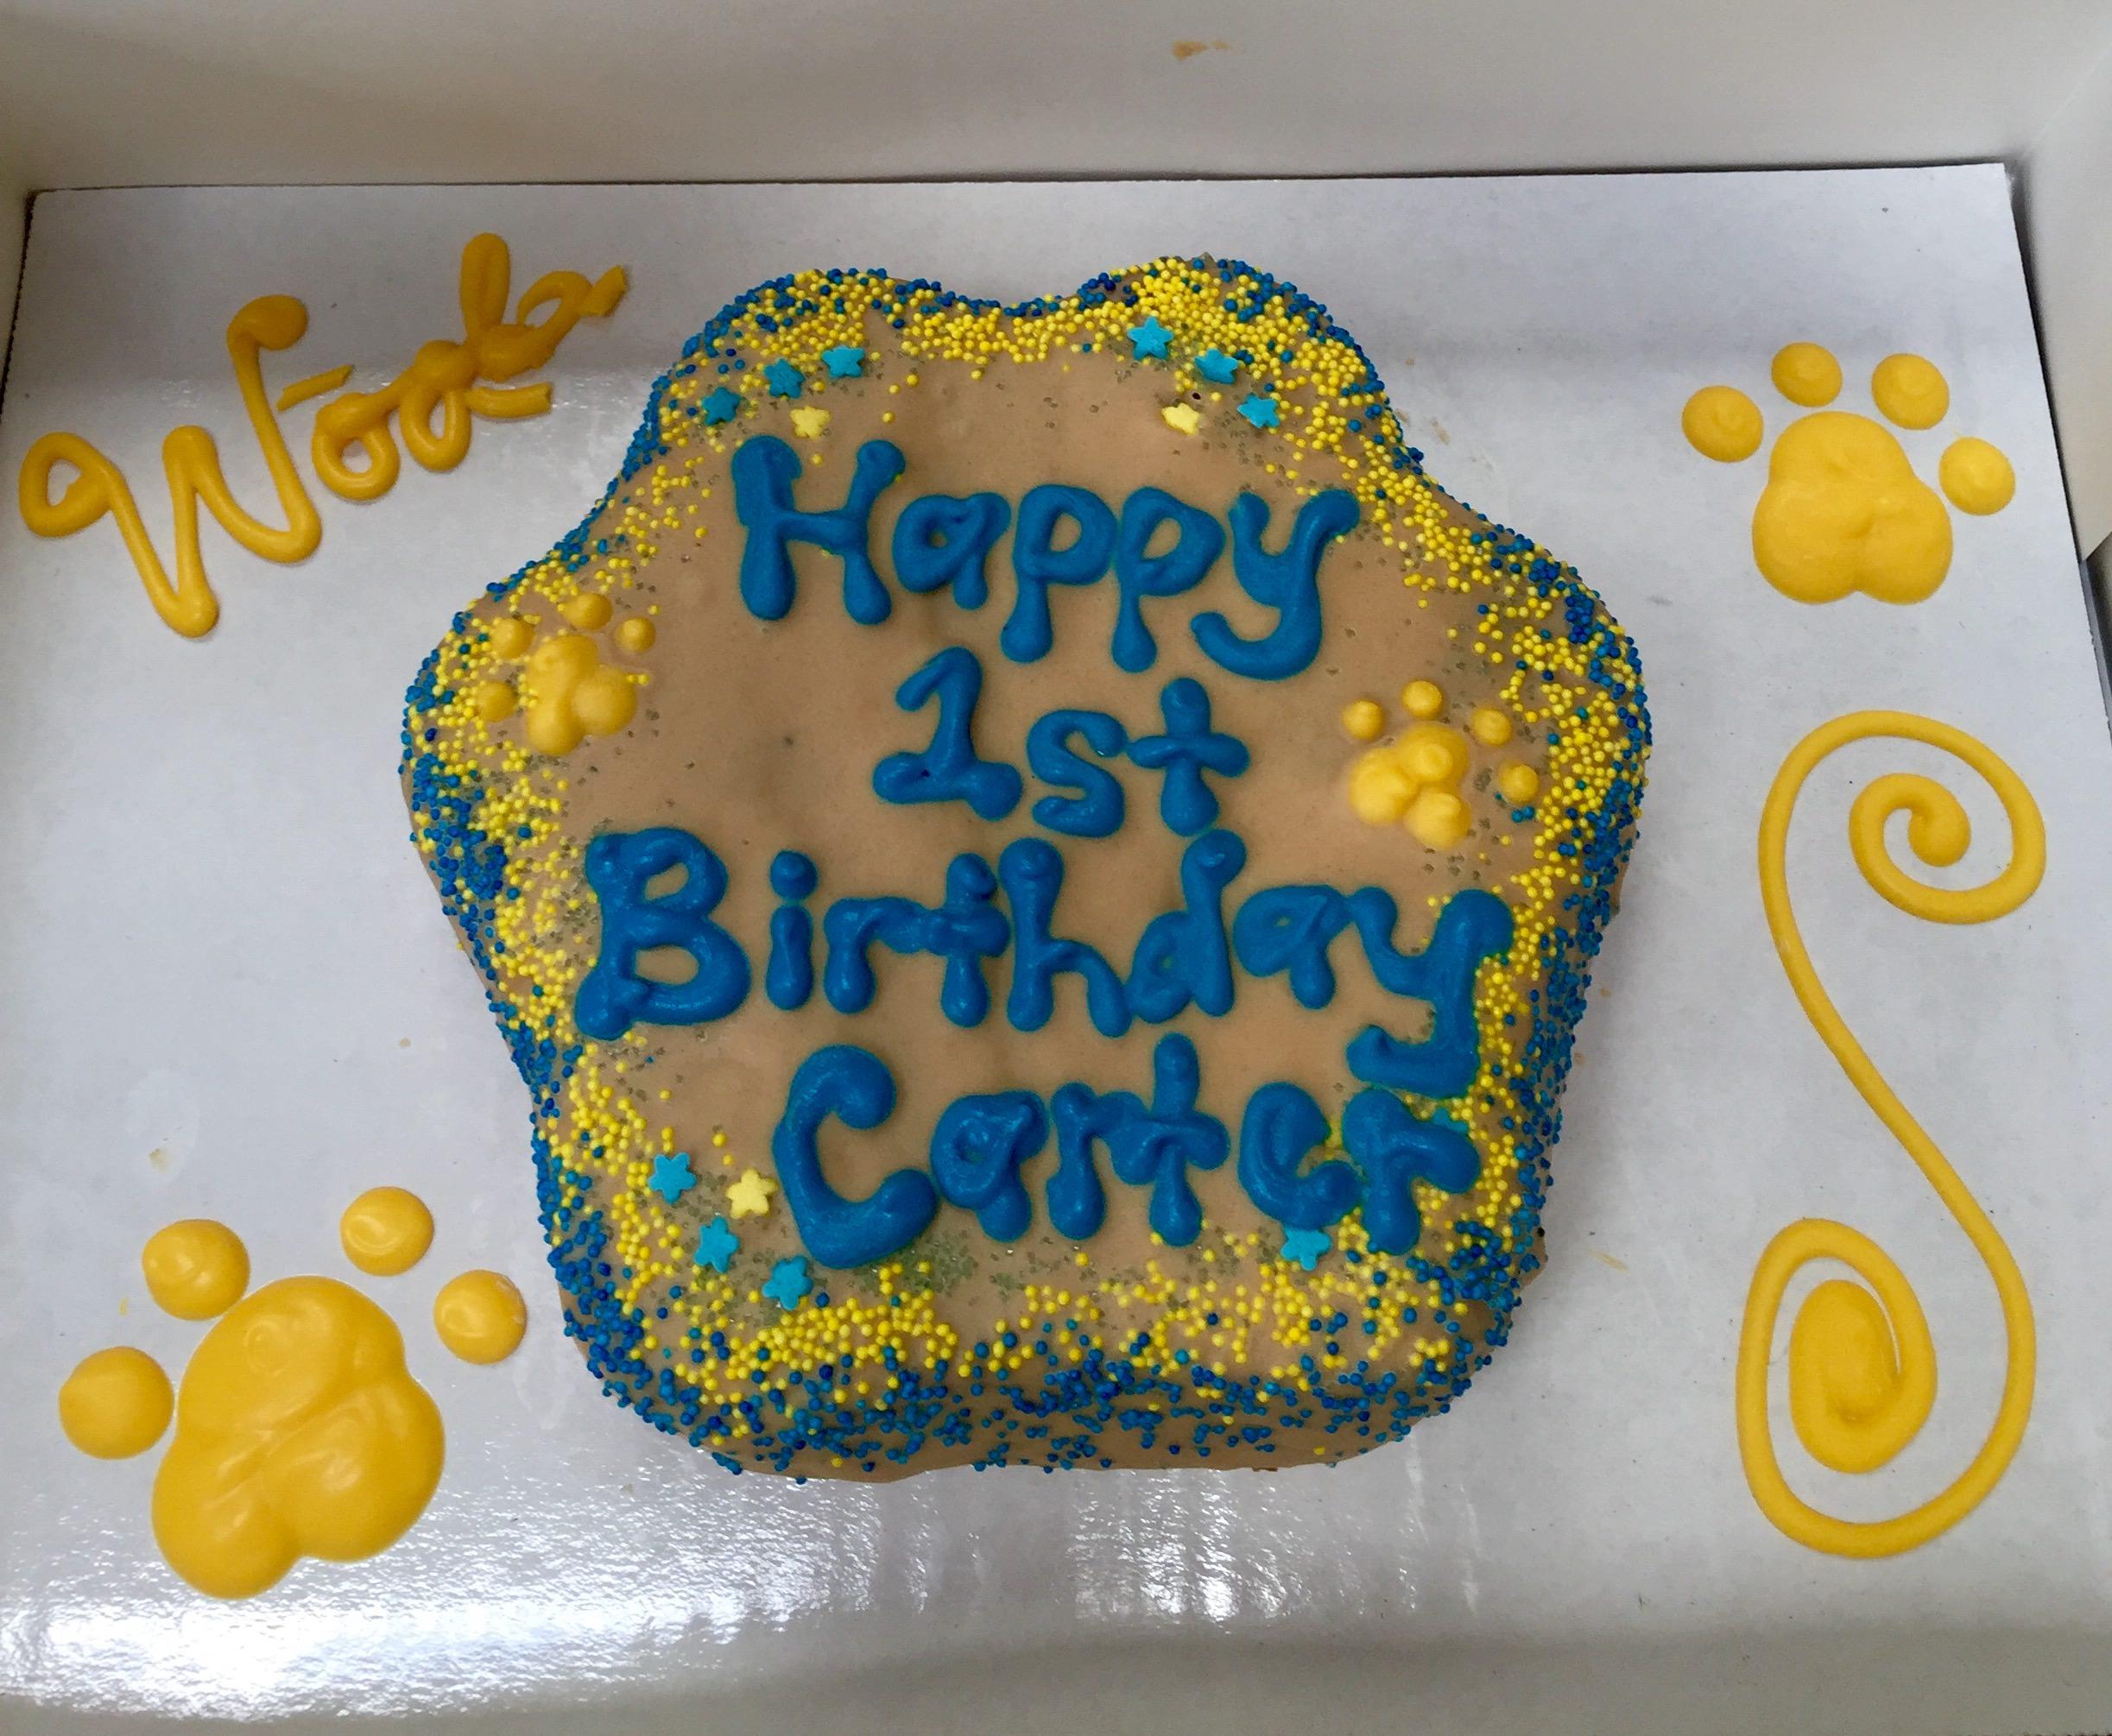 Carter the Cavapoo's birthday cake